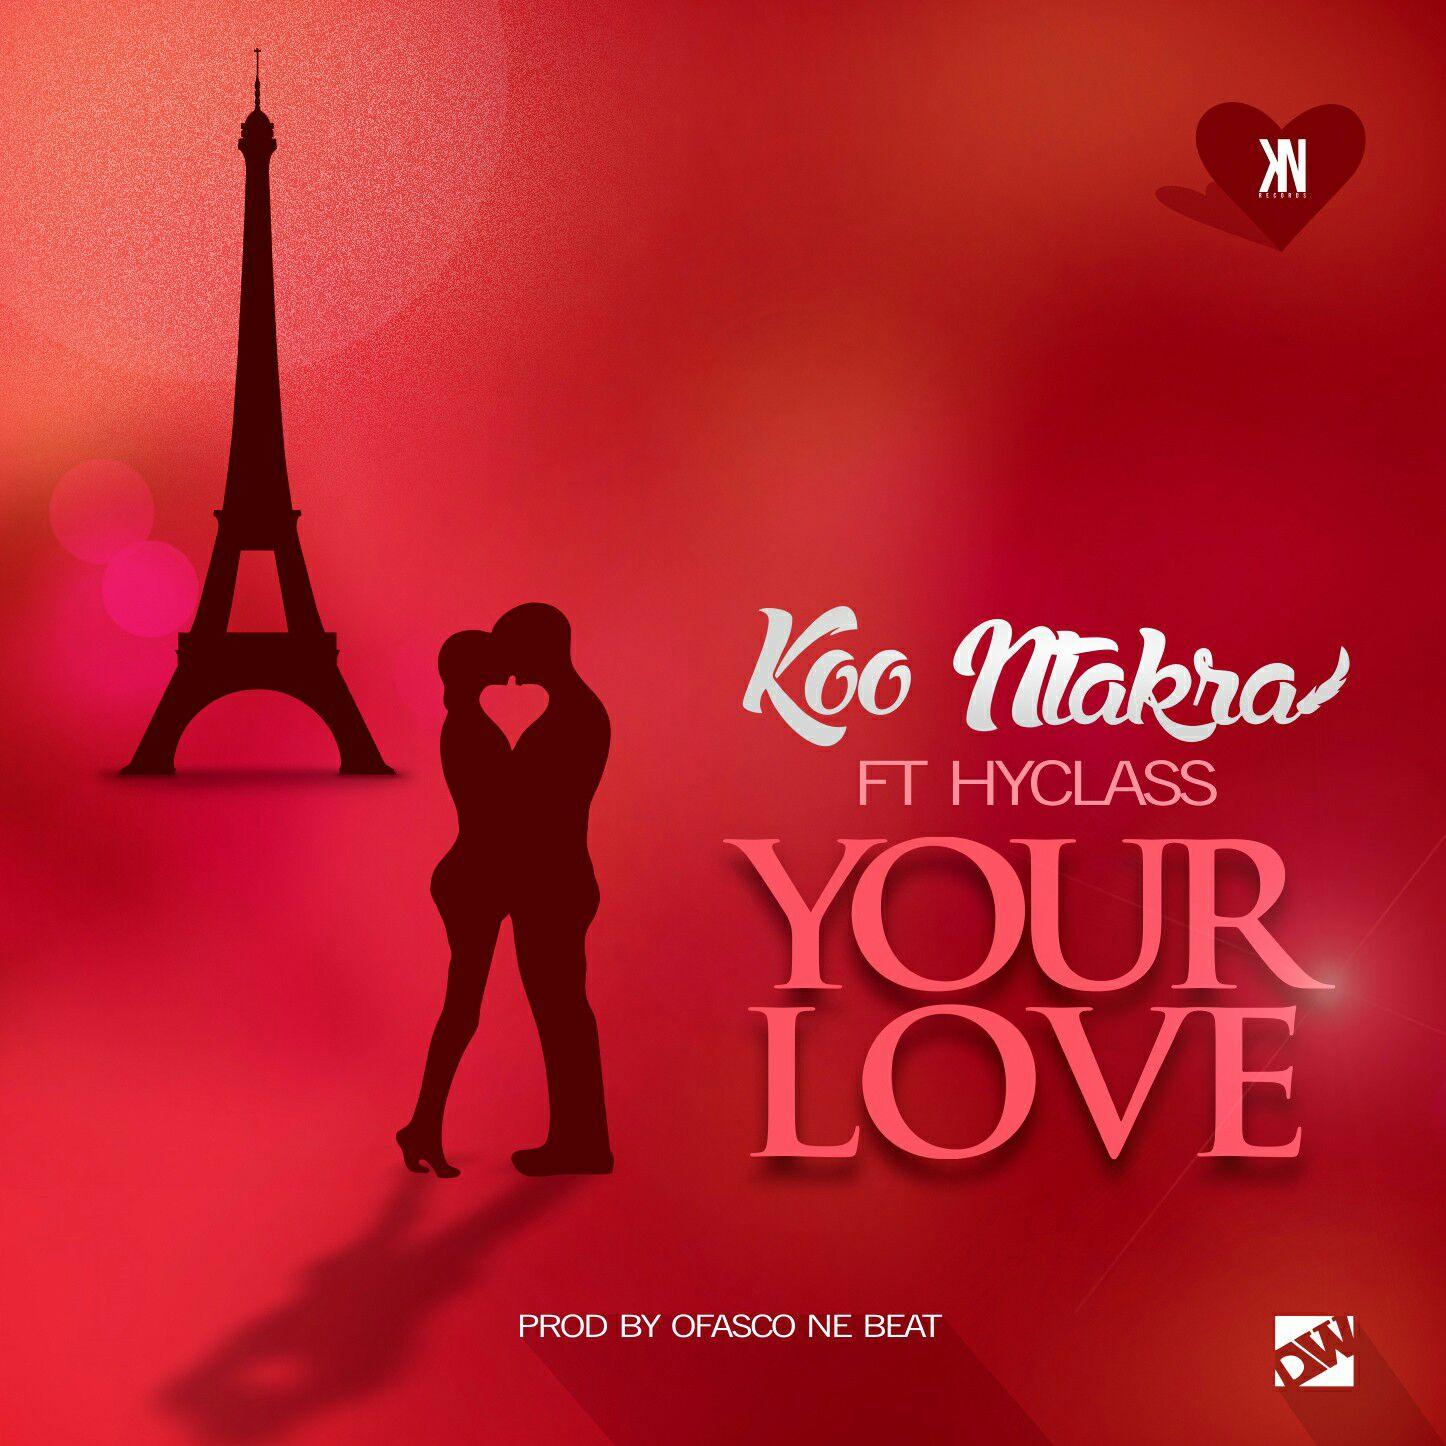 Koo Ntakra Yuh Love